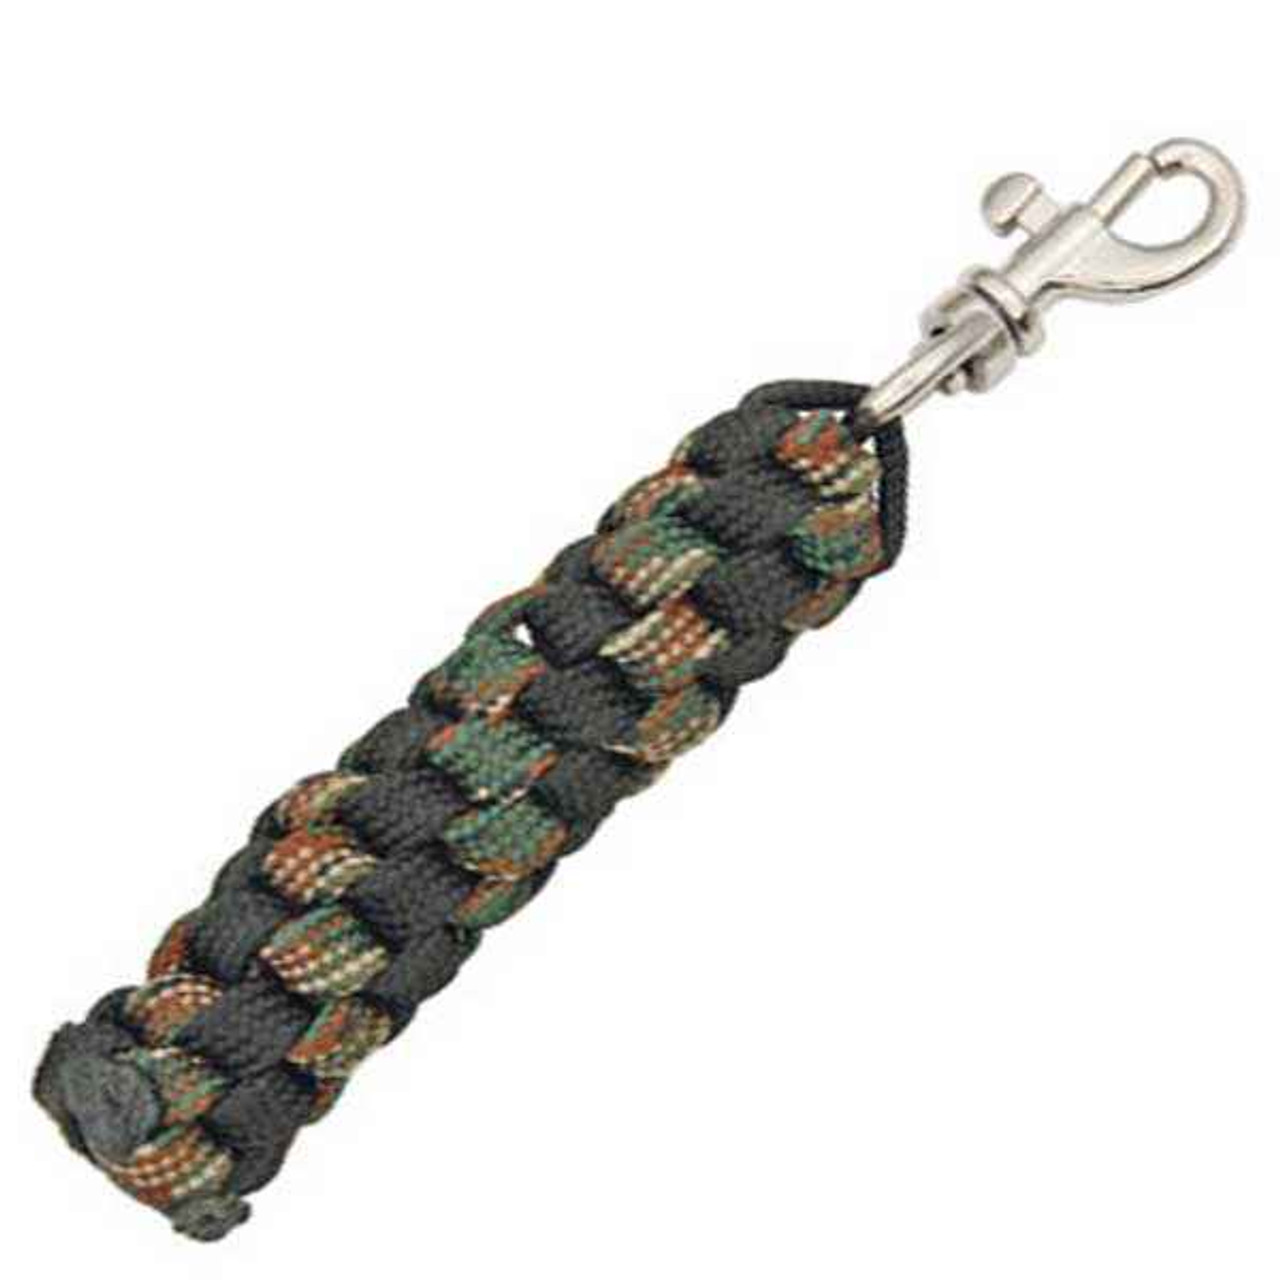 Para Cord Key Chain Black and Woodland Camo